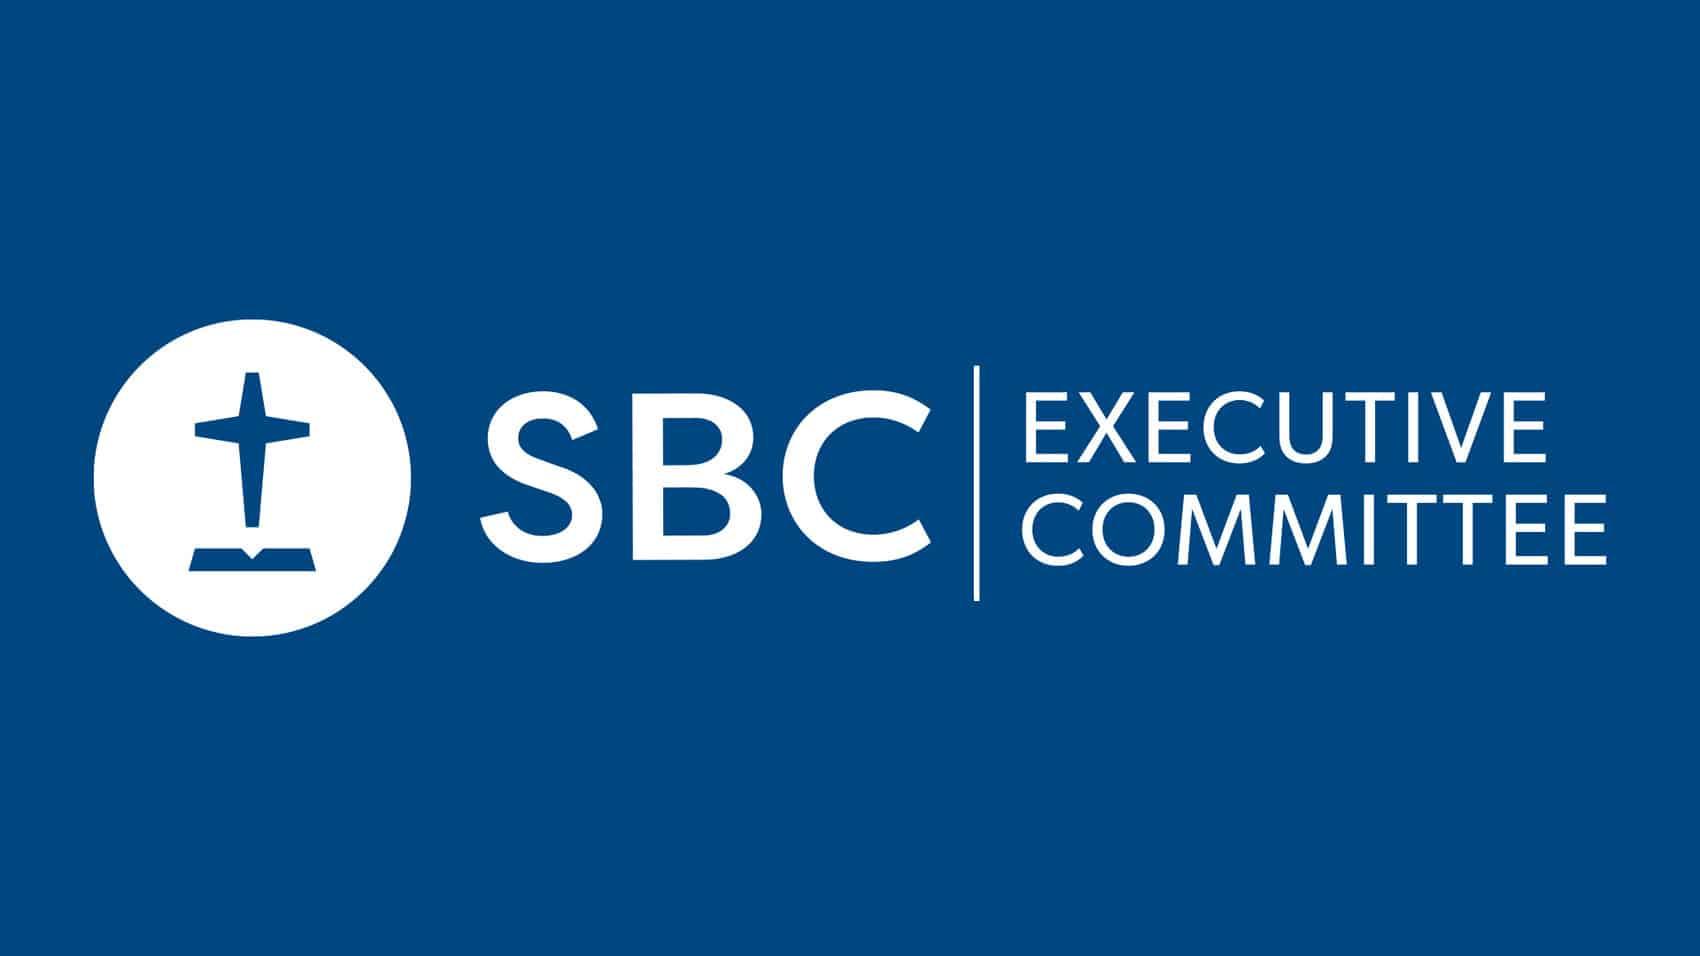 SBC Executive Committee